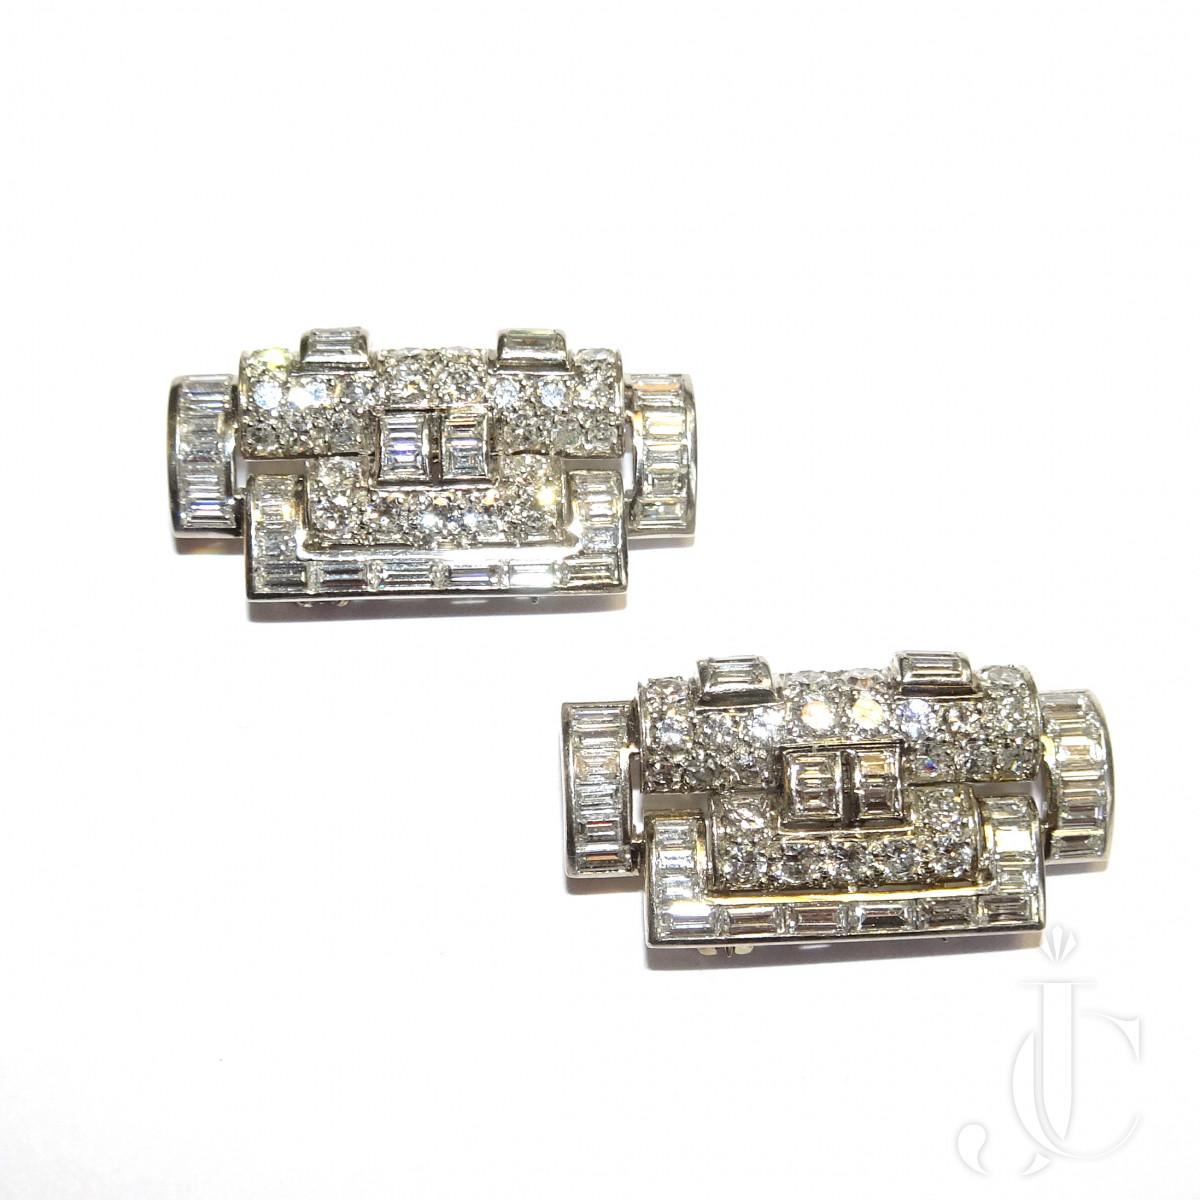 2 Boivin Diamond Dress Clips